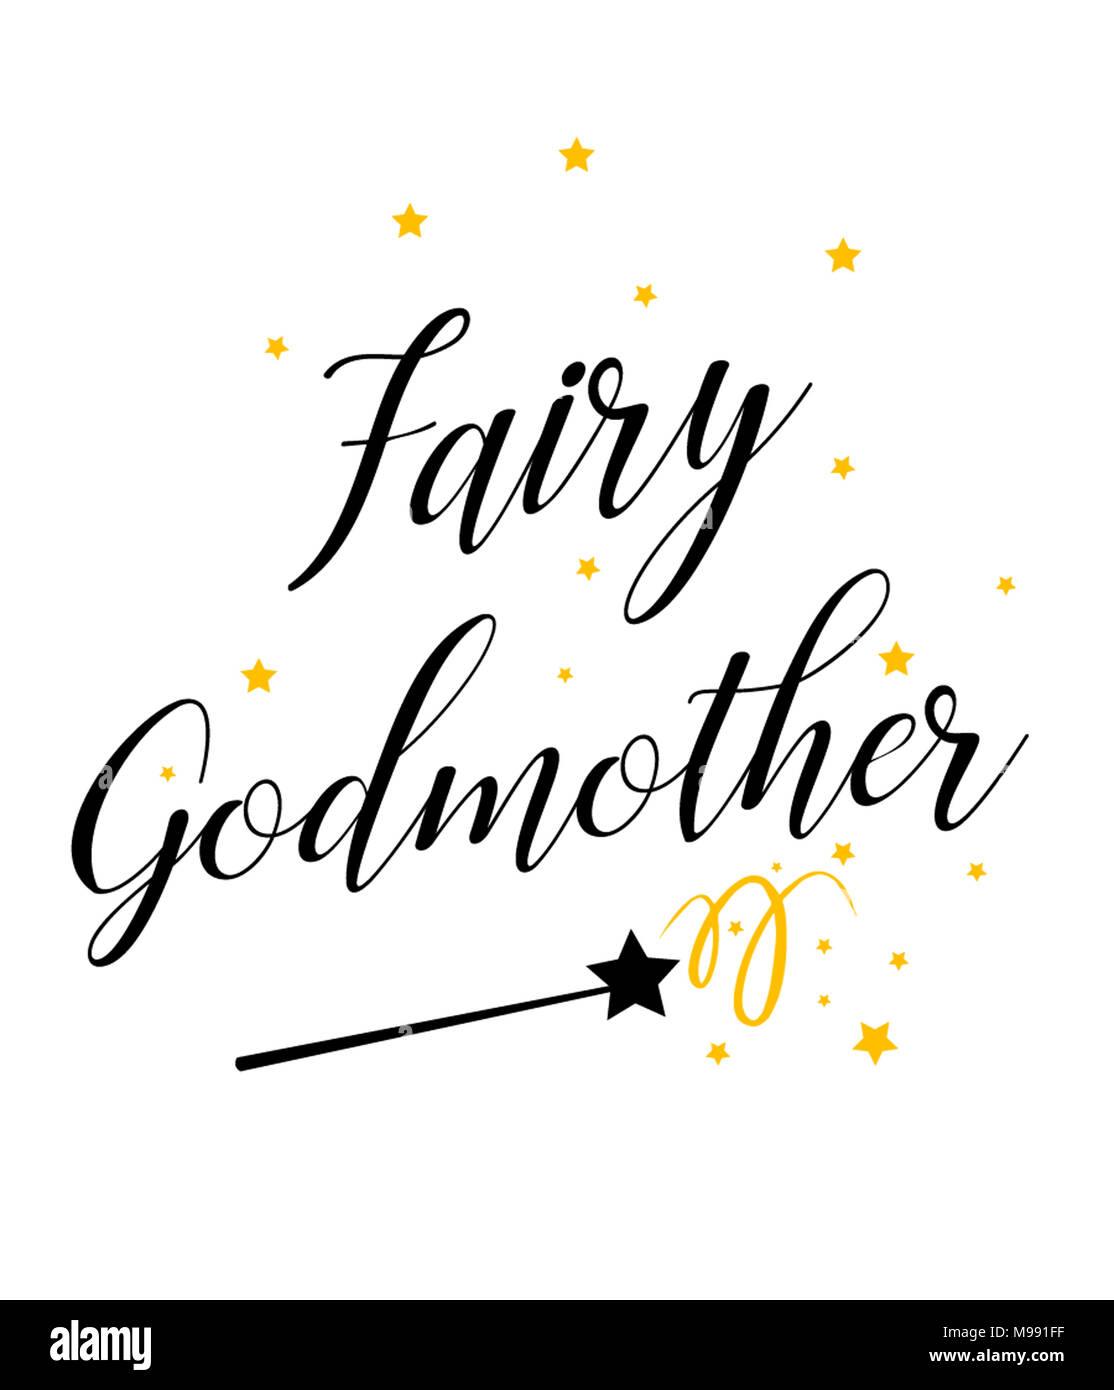 Fairy Godmother Design - Stock Image